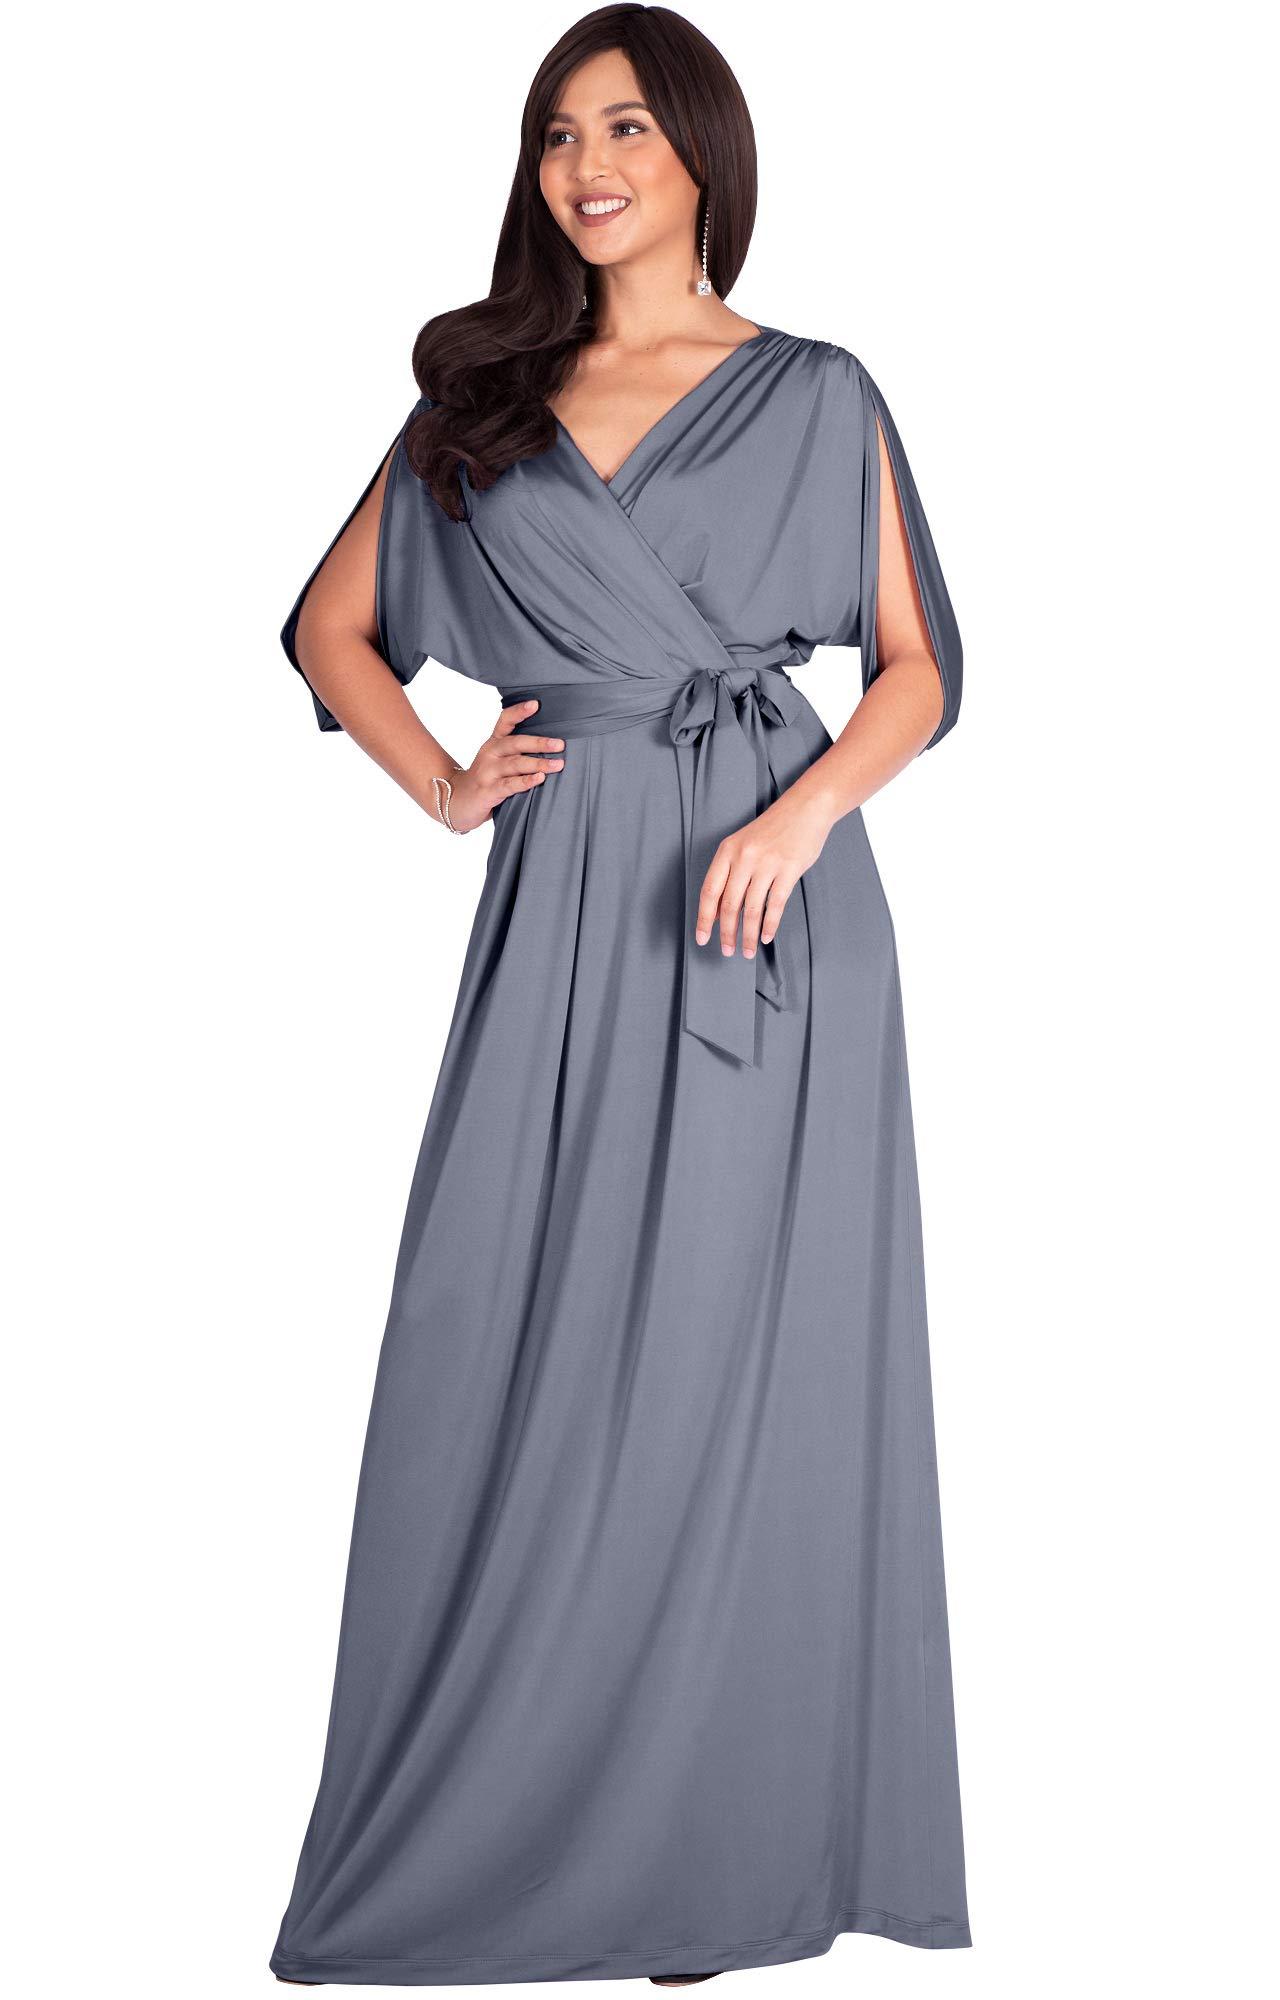 Maxi Dress Plus Size Wedding Guest 60 Off Awi Com,Open Back Stella York Wedding Dresses